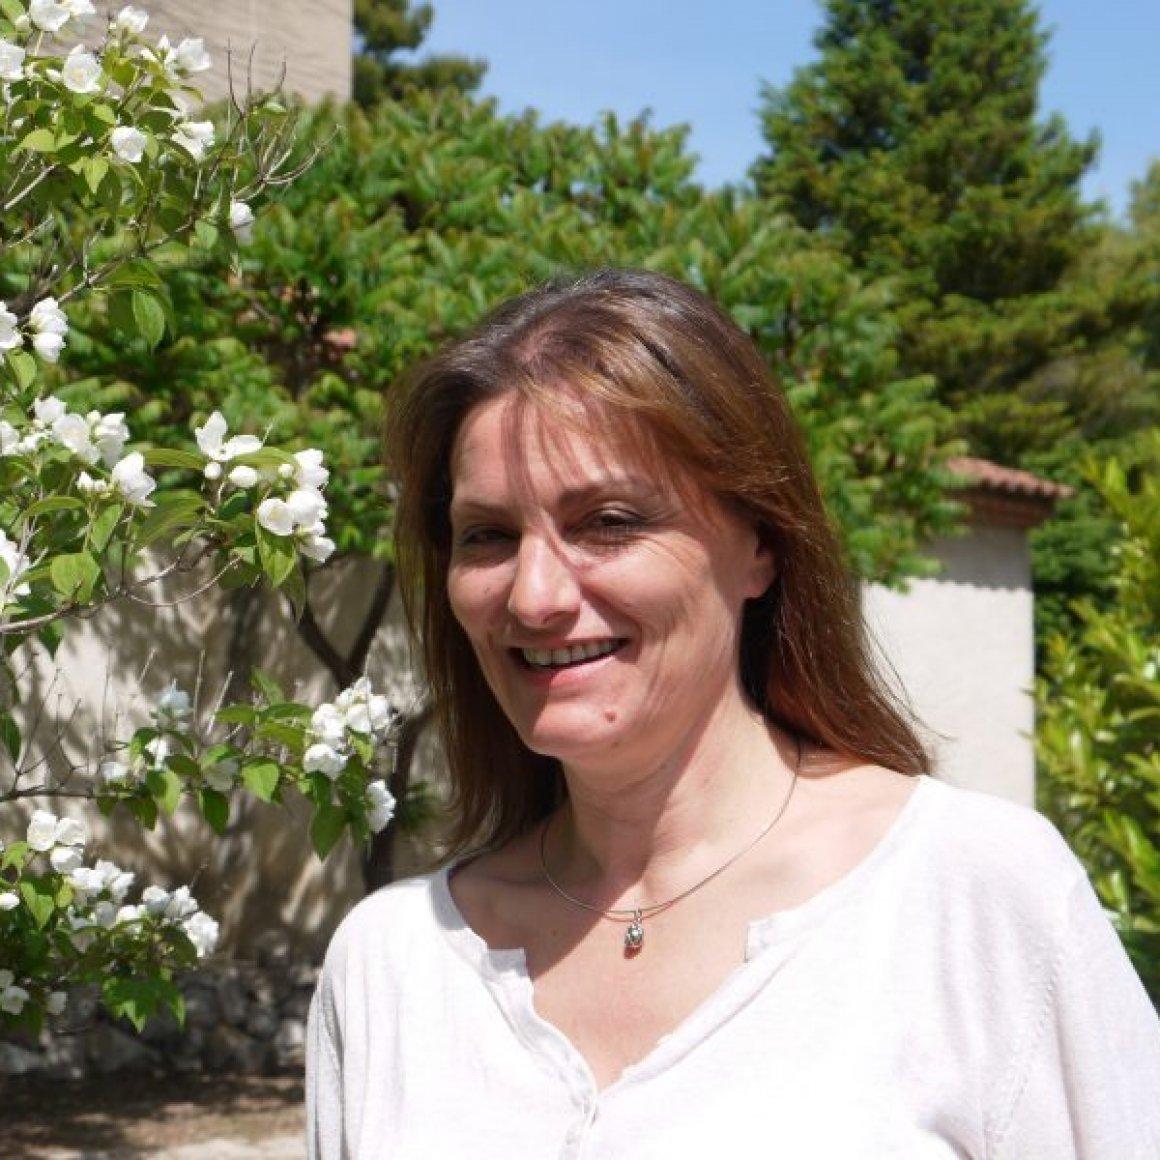 Mireille Immordino